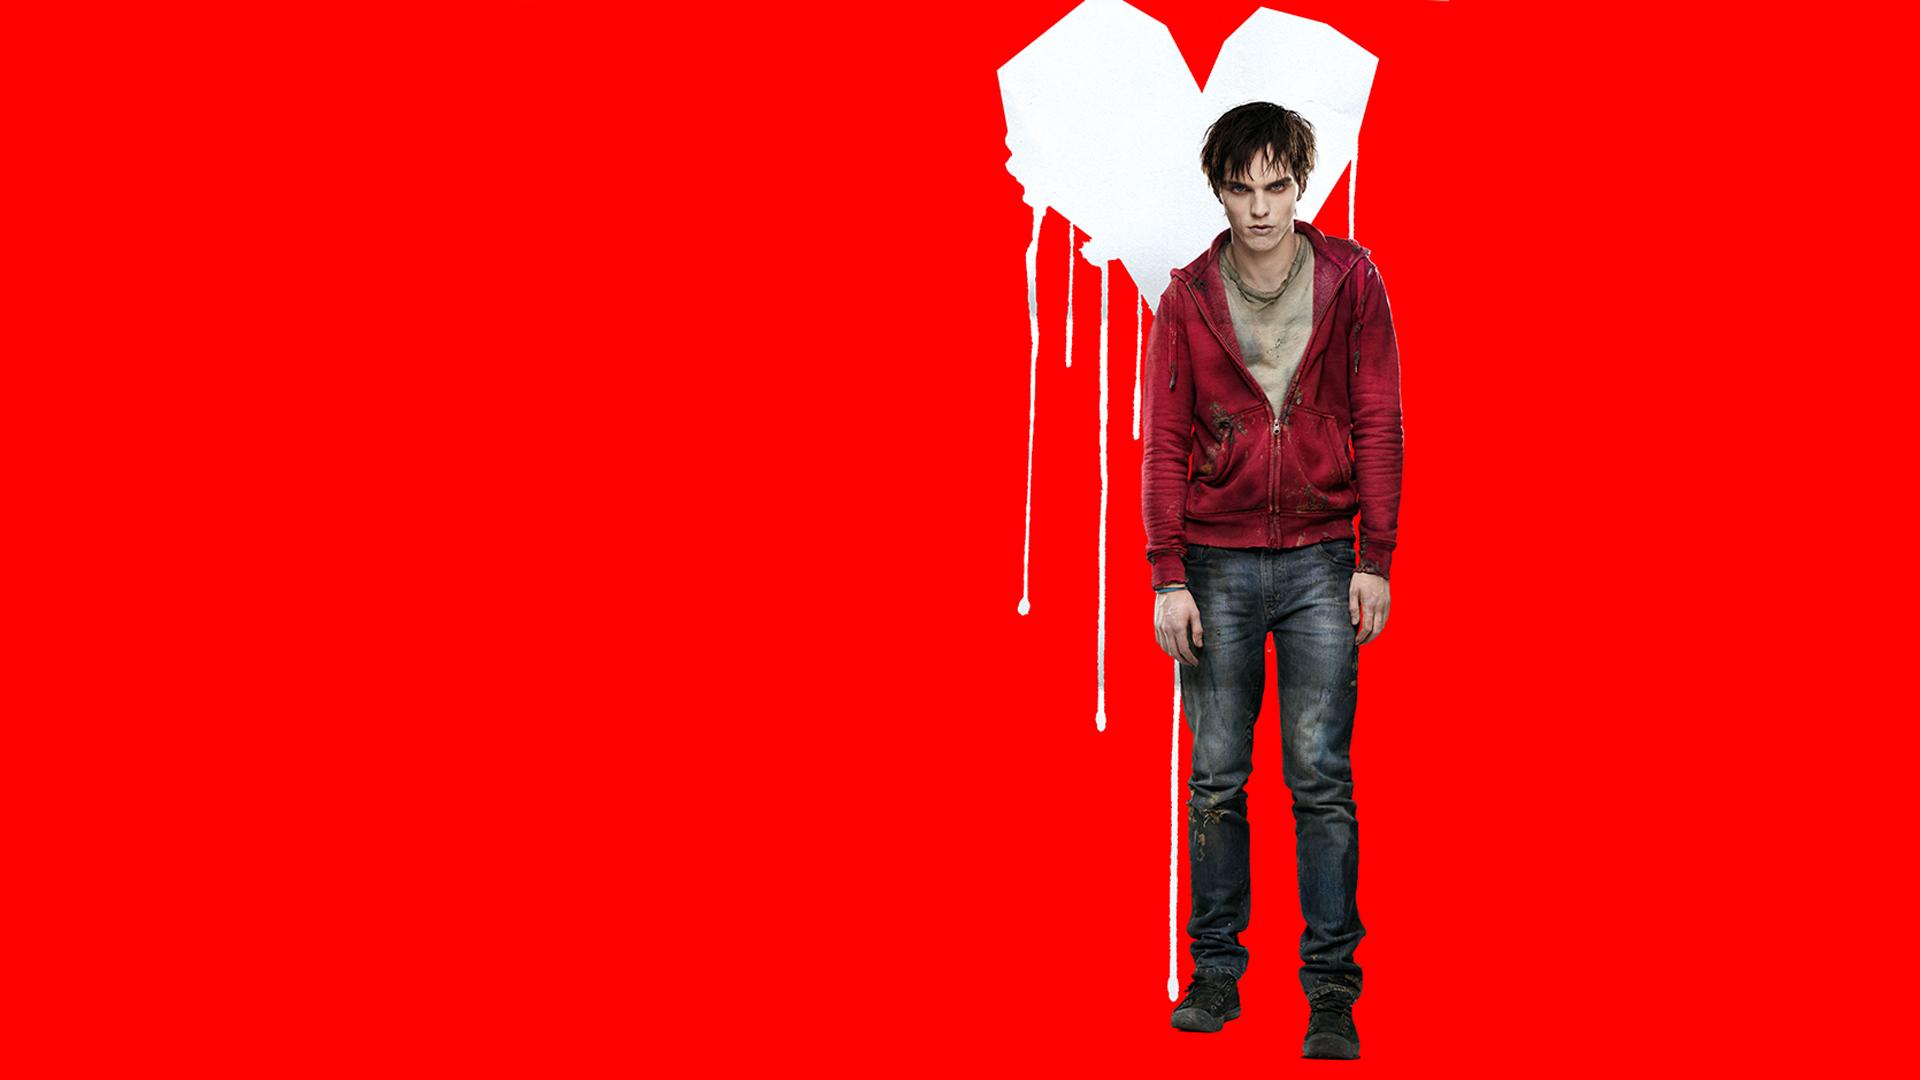 WARM BODIES zombie zombies wallpaper backgroundWarm Bodies Wallpaper